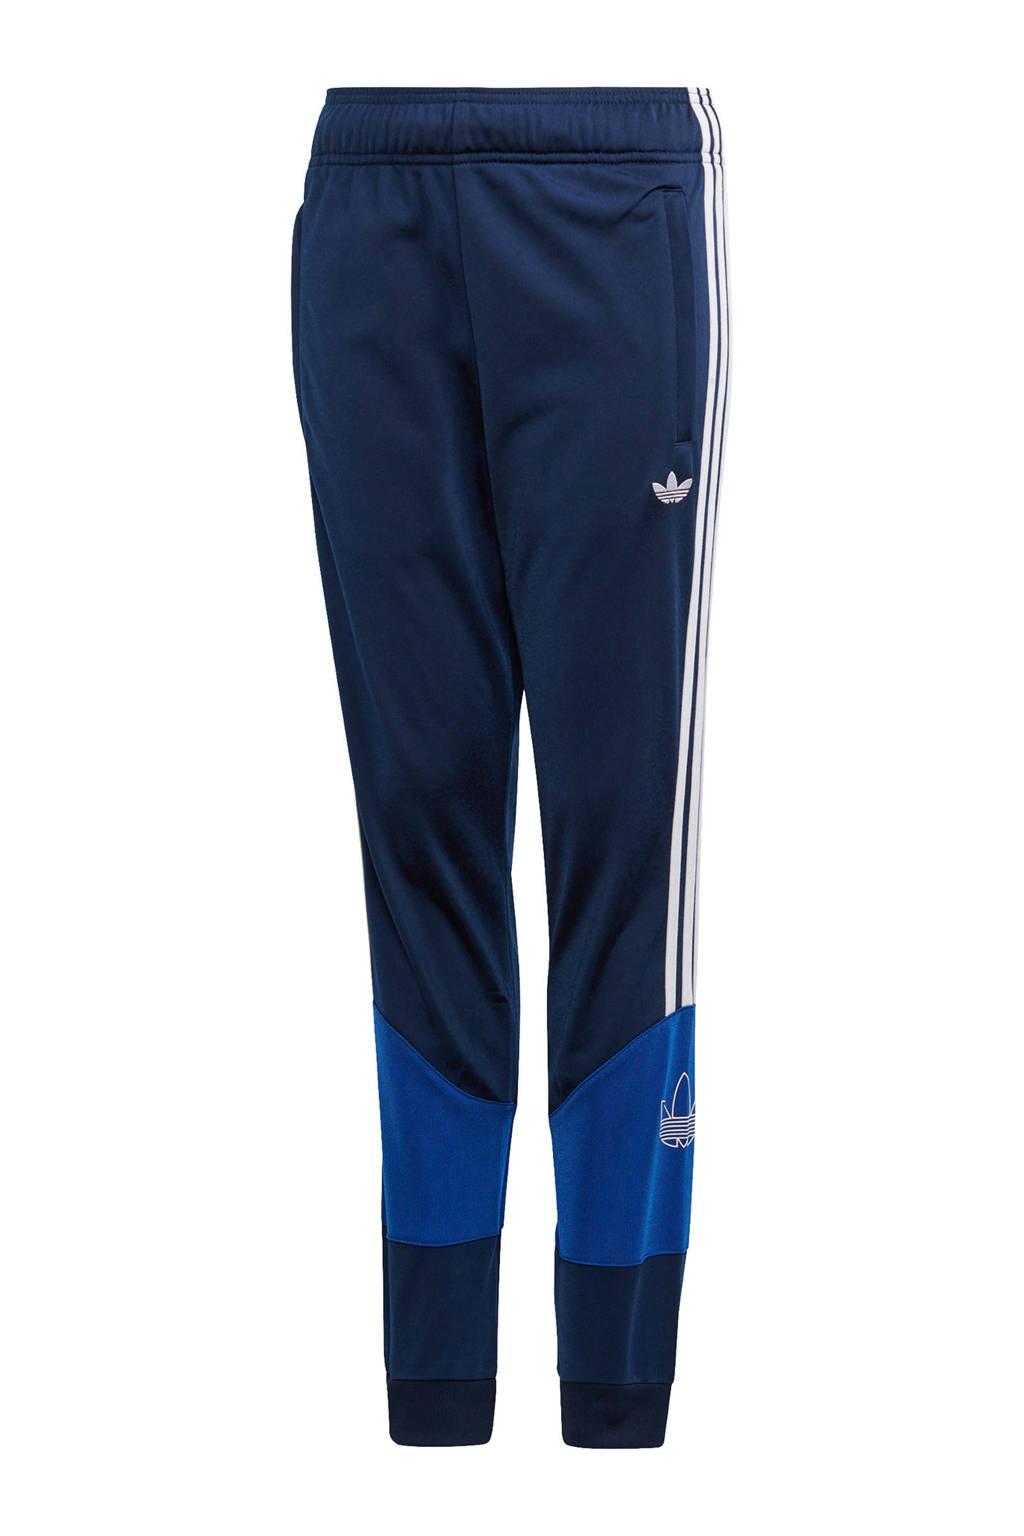 adidas Originals   trainingsbroek donkerblauw/blauw, Donkerblauw/blauw